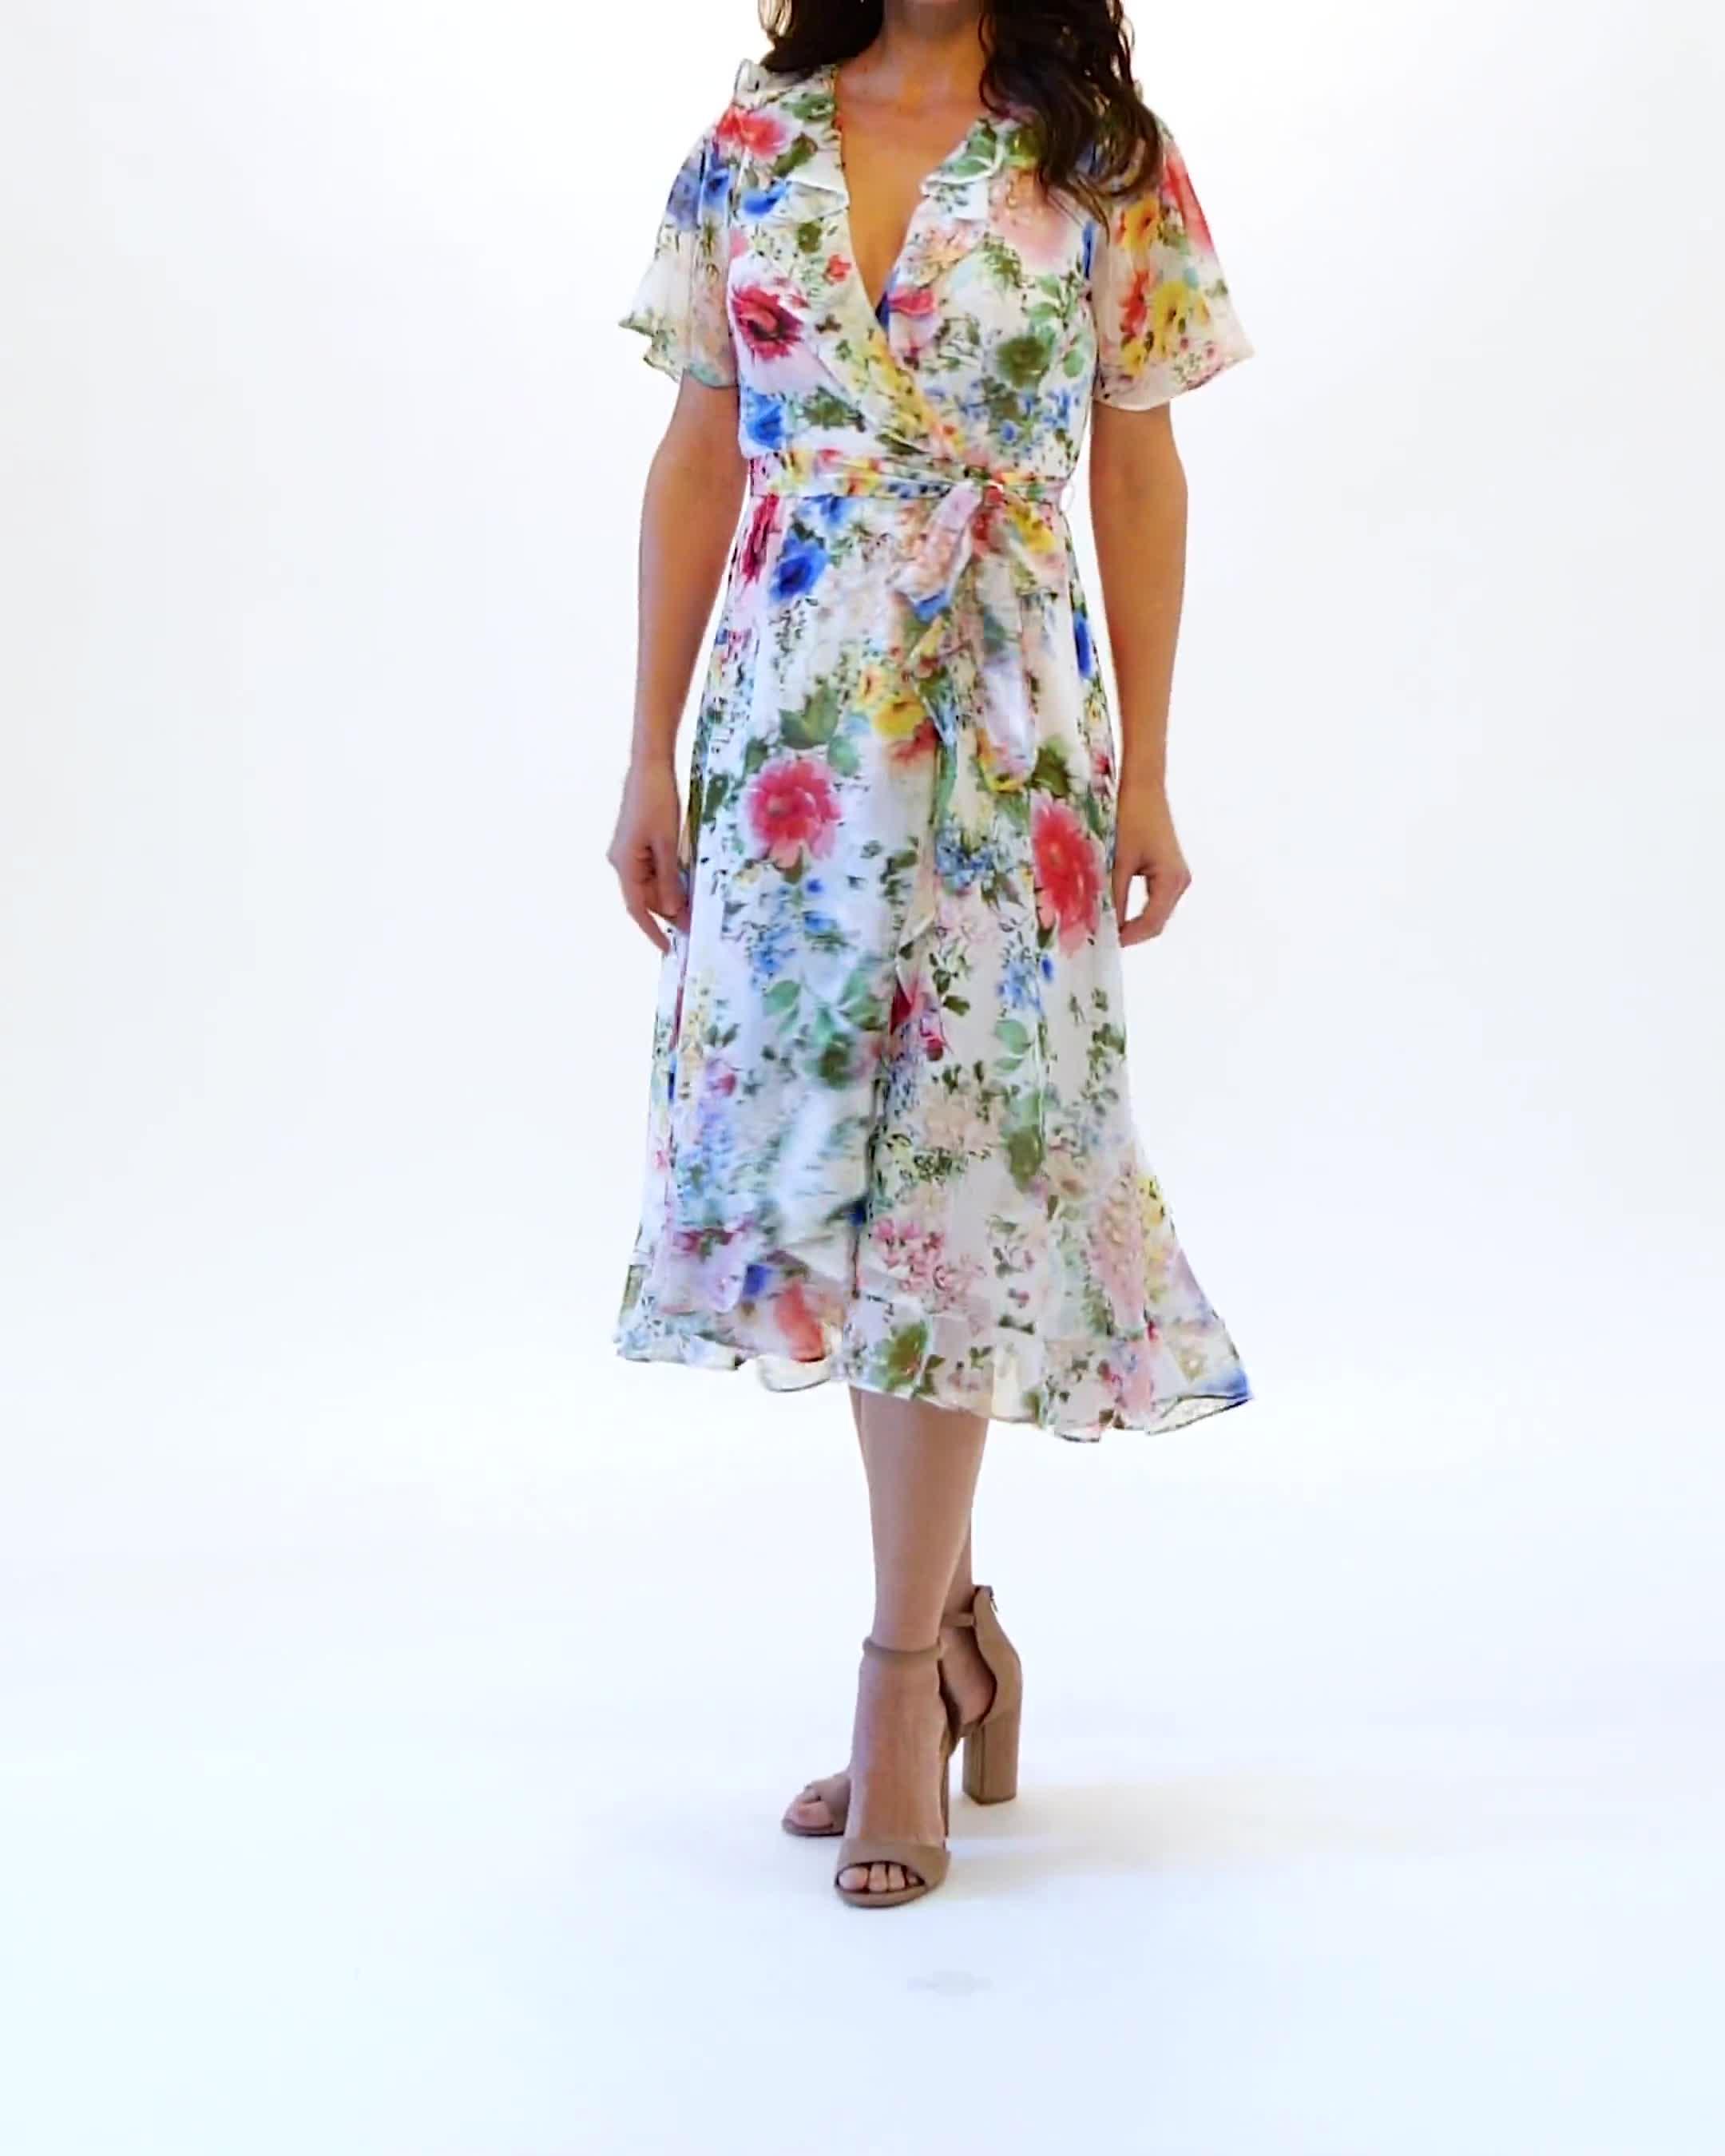 Floral Chiffon Wrap Ruffle Dress - Video